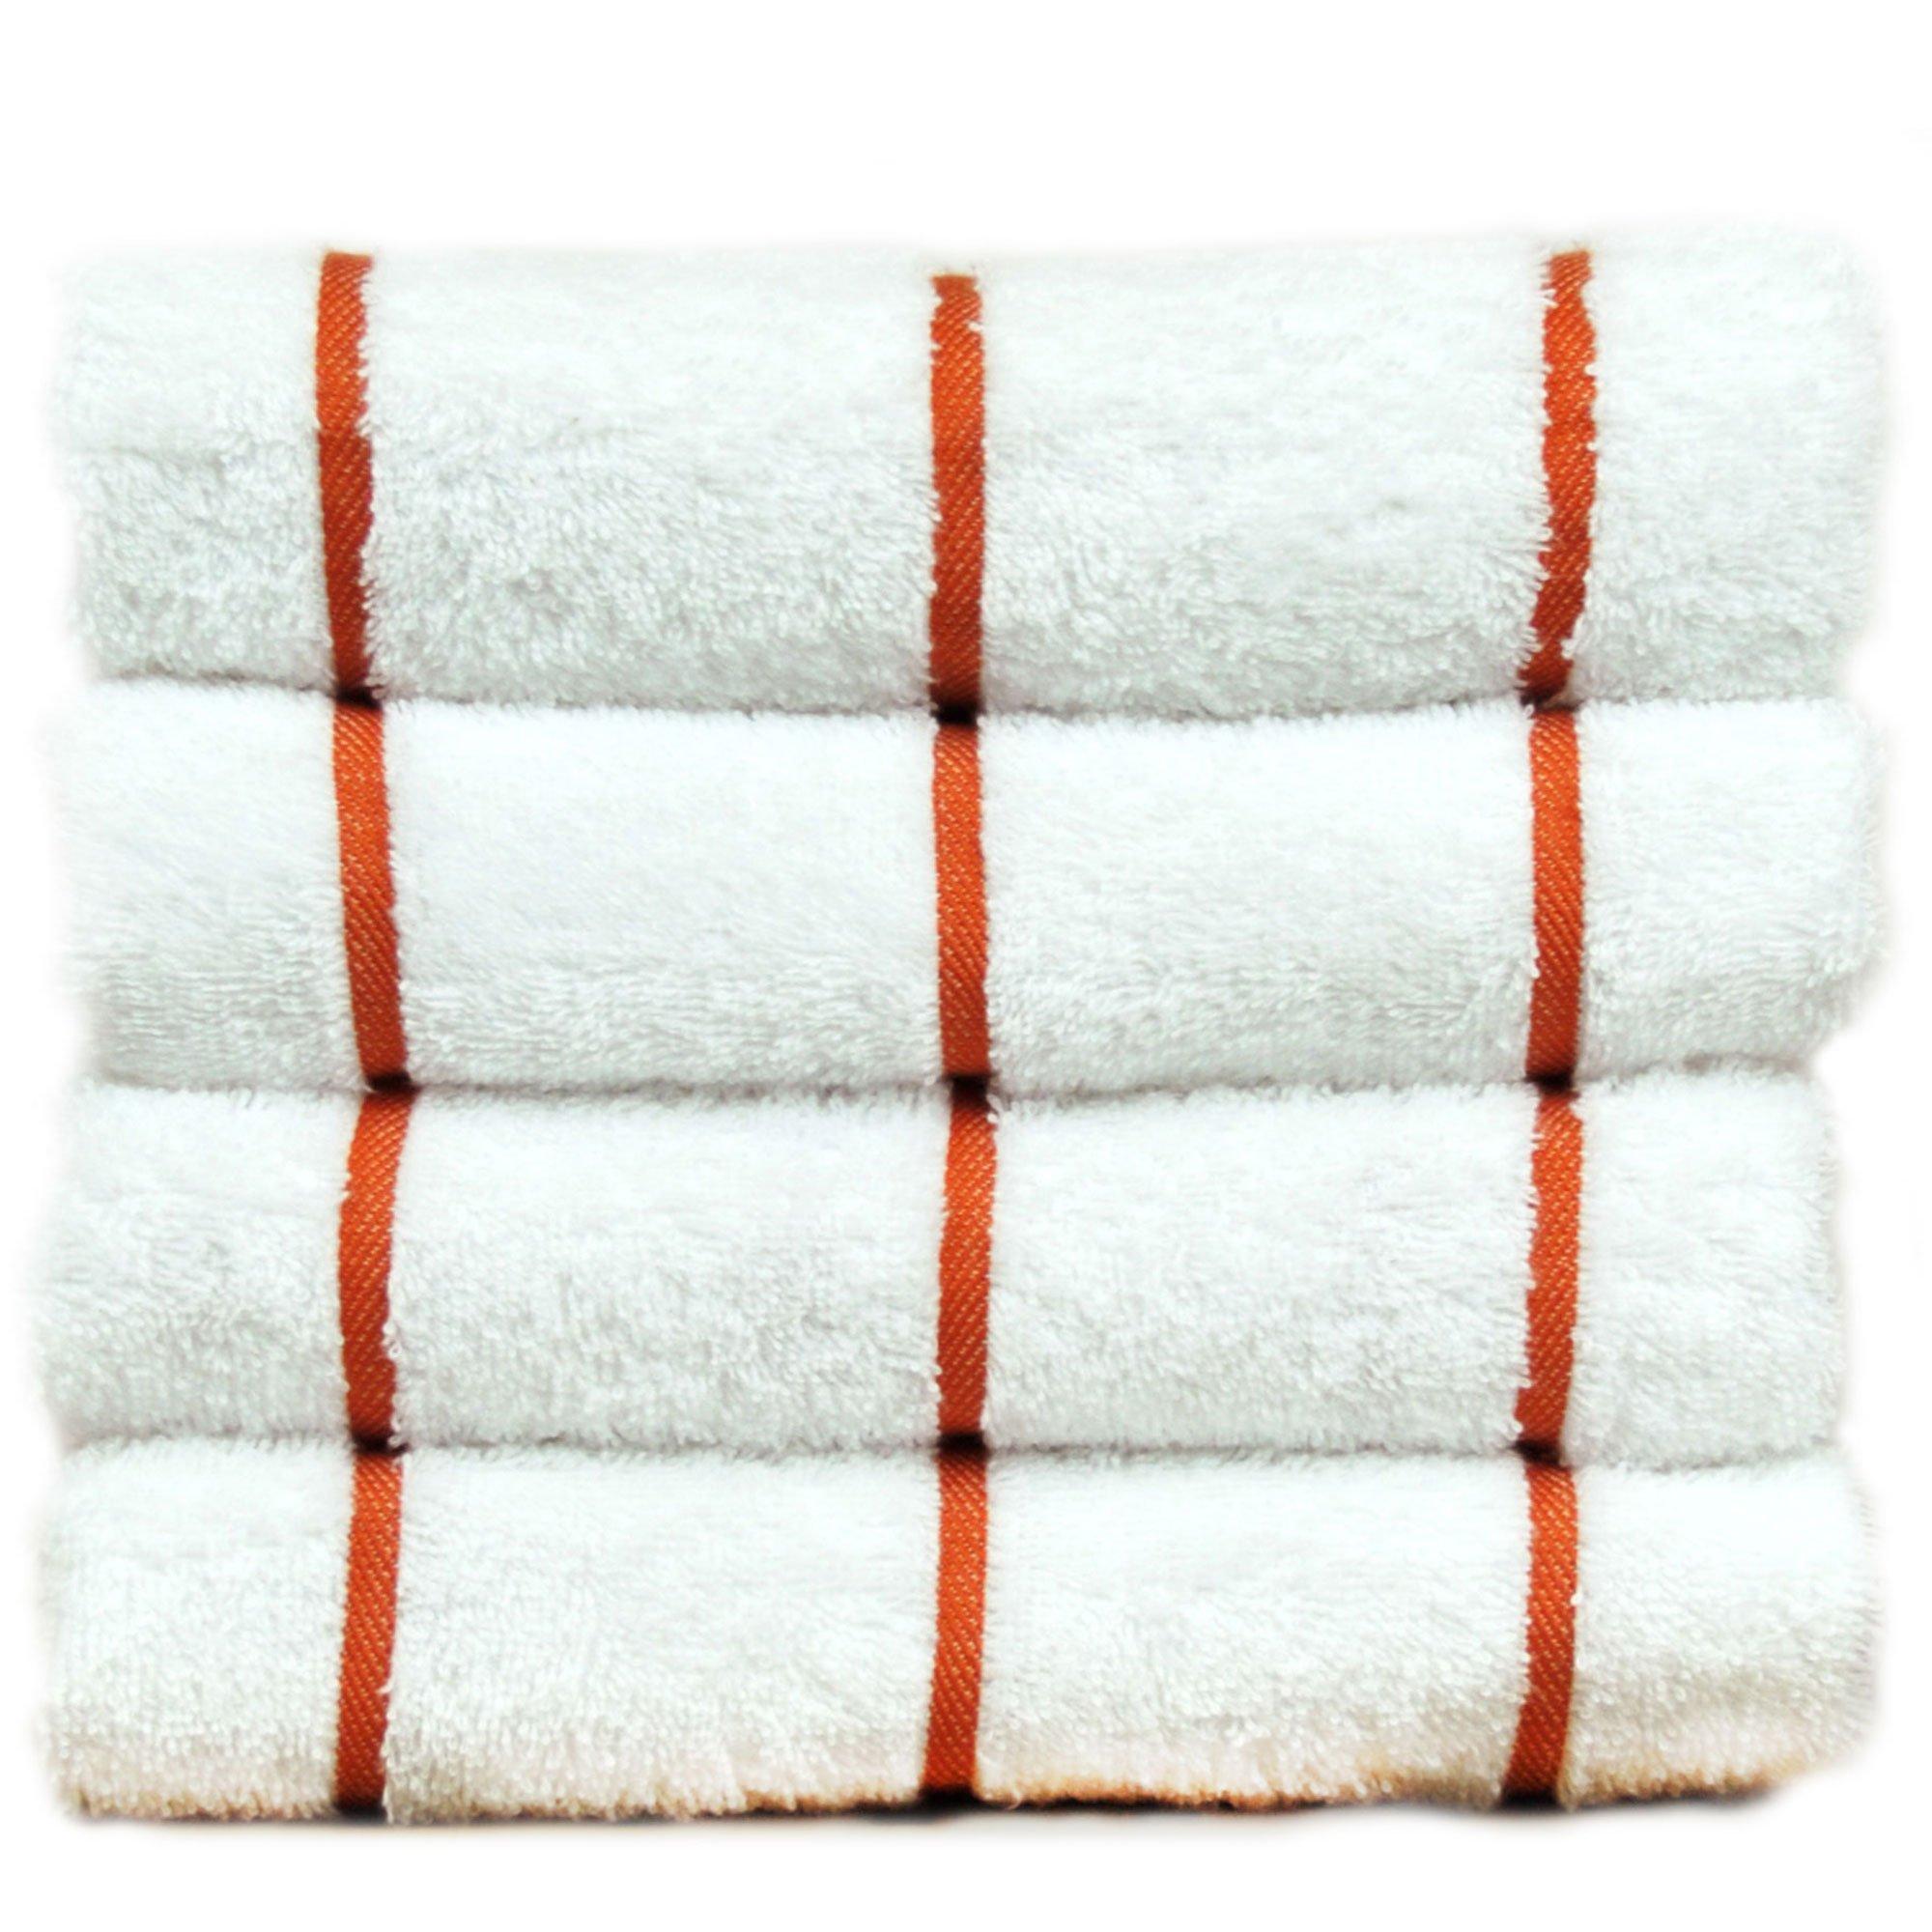 Luxury Hotel & Spa Towel Turkish Cotton Pool Beach Towels - Brick Red - Striped - Set of 4